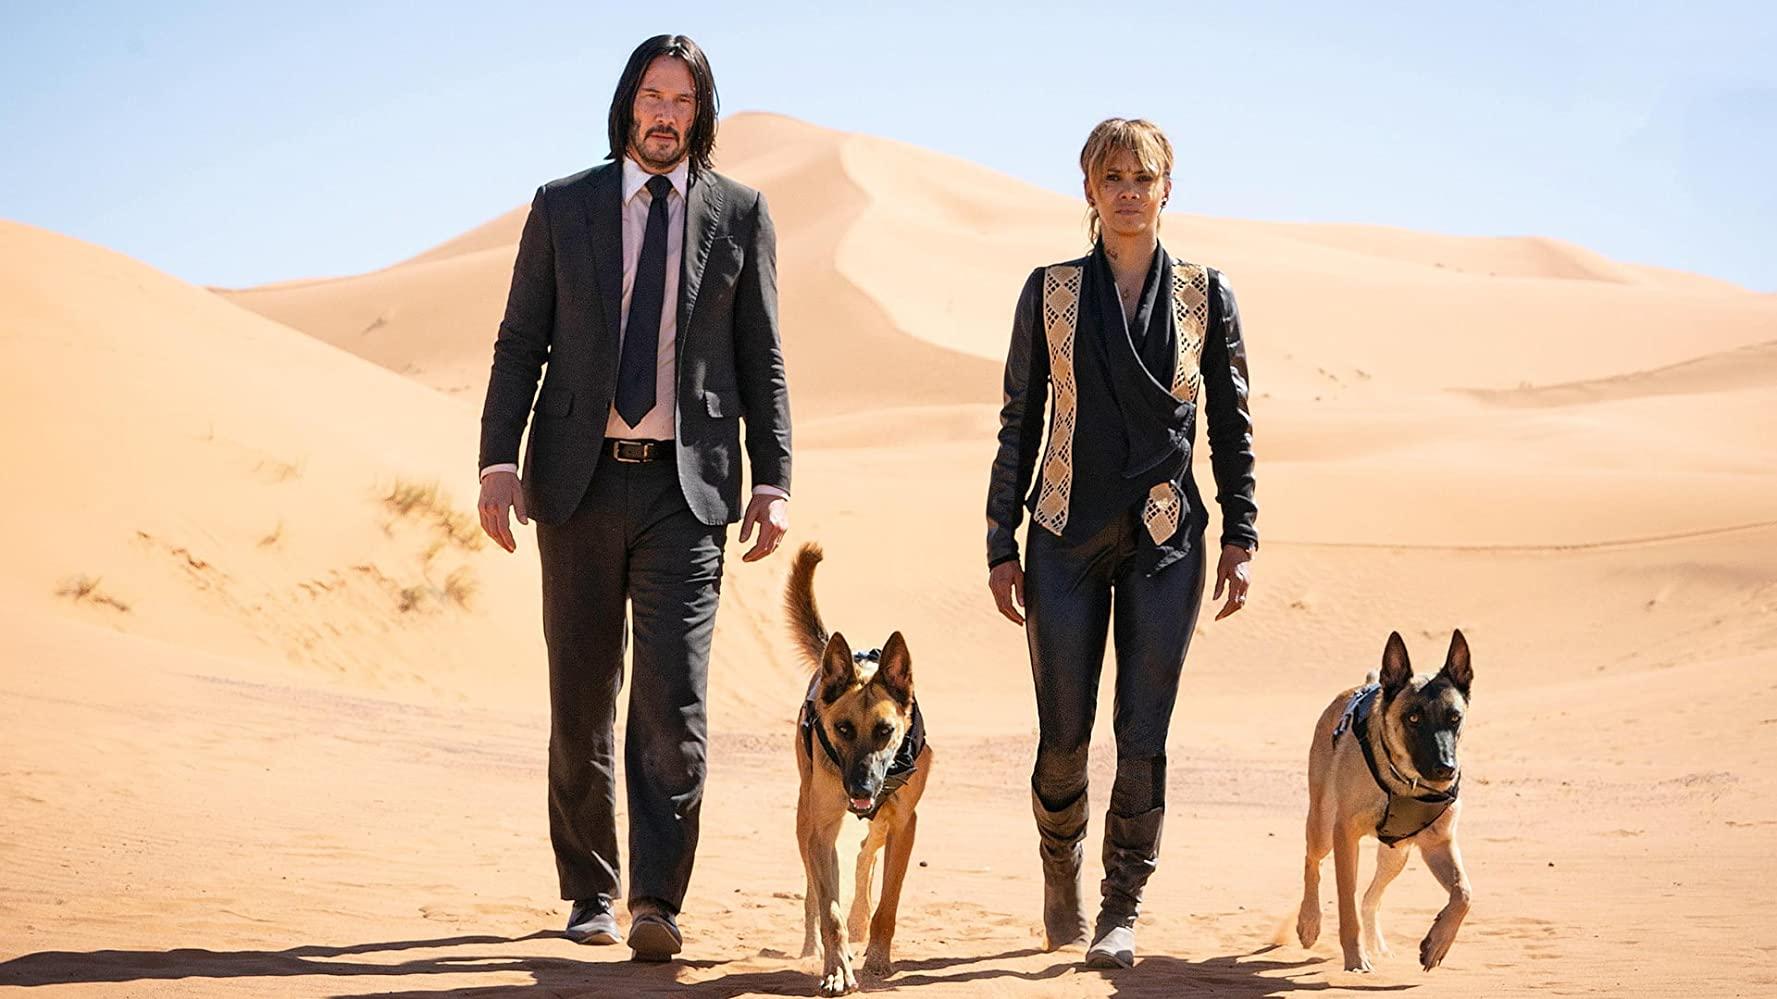 Keanu Reeves e Halle Berry em 'John Wick 3 - Parabellum'